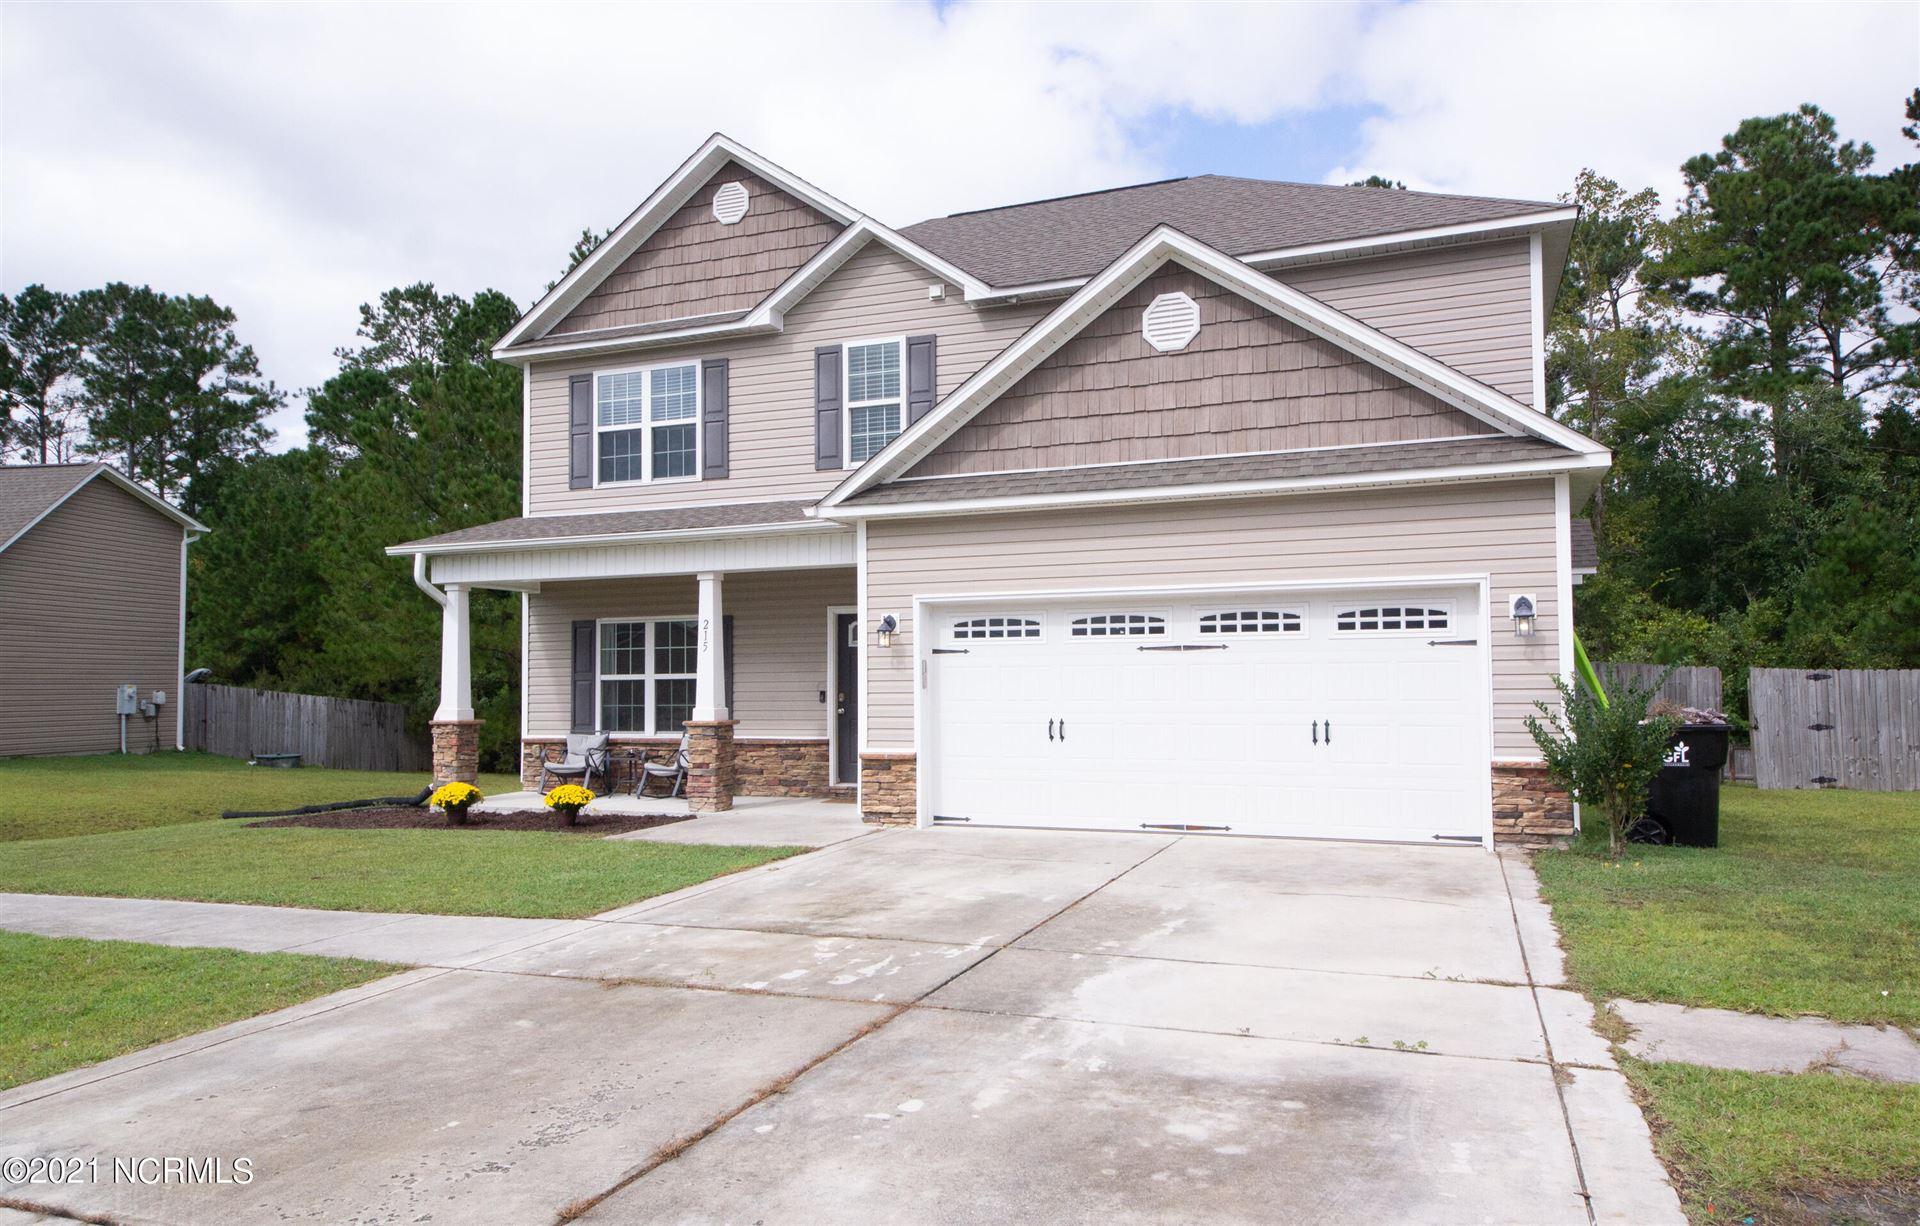 Photo of 215 Riverstone Court, Jacksonville, NC 28546 (MLS # 100294671)